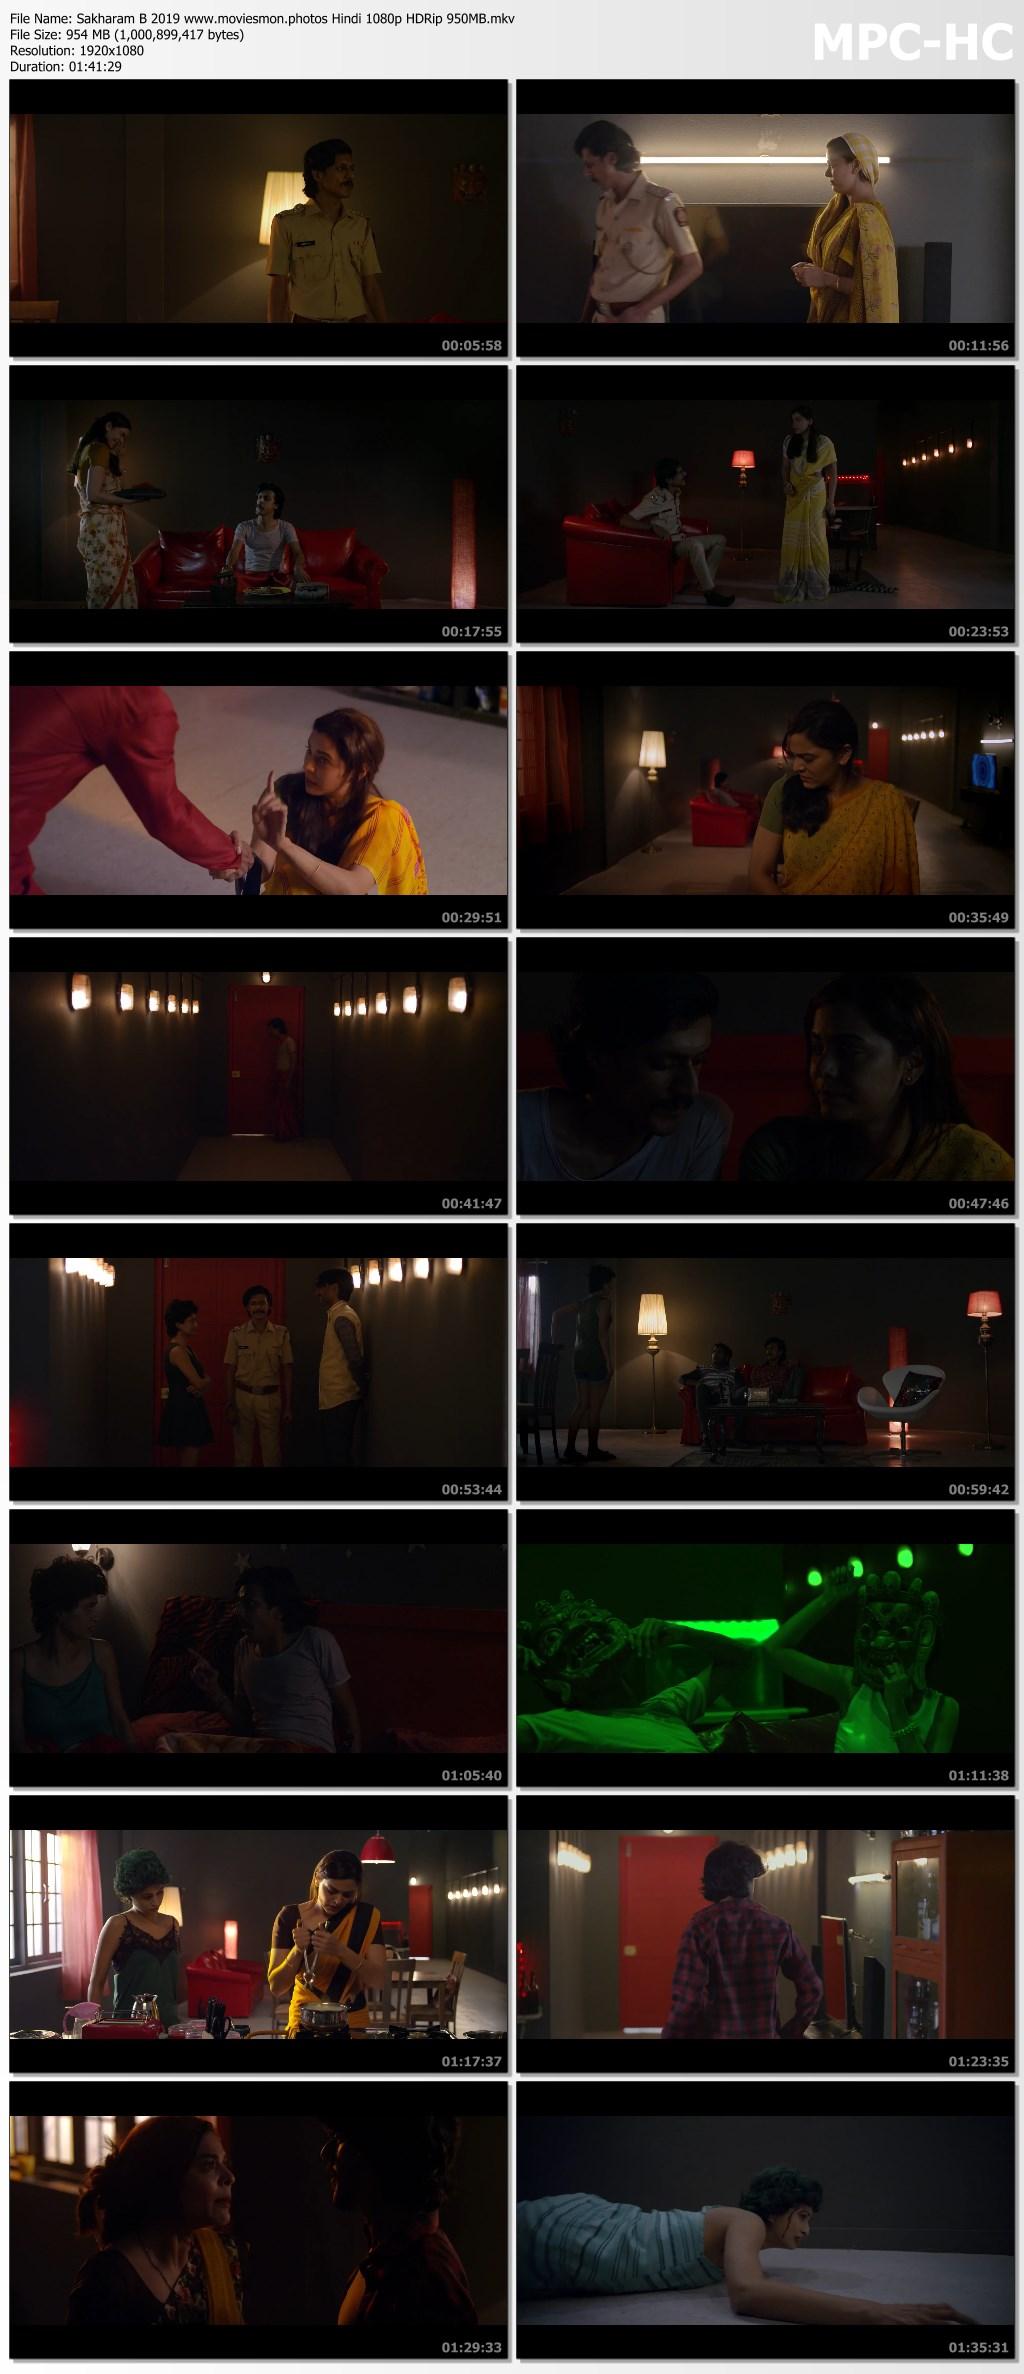 Sakharam B 2019 Hindi Full Movie 1080p HDRip 950MB Download